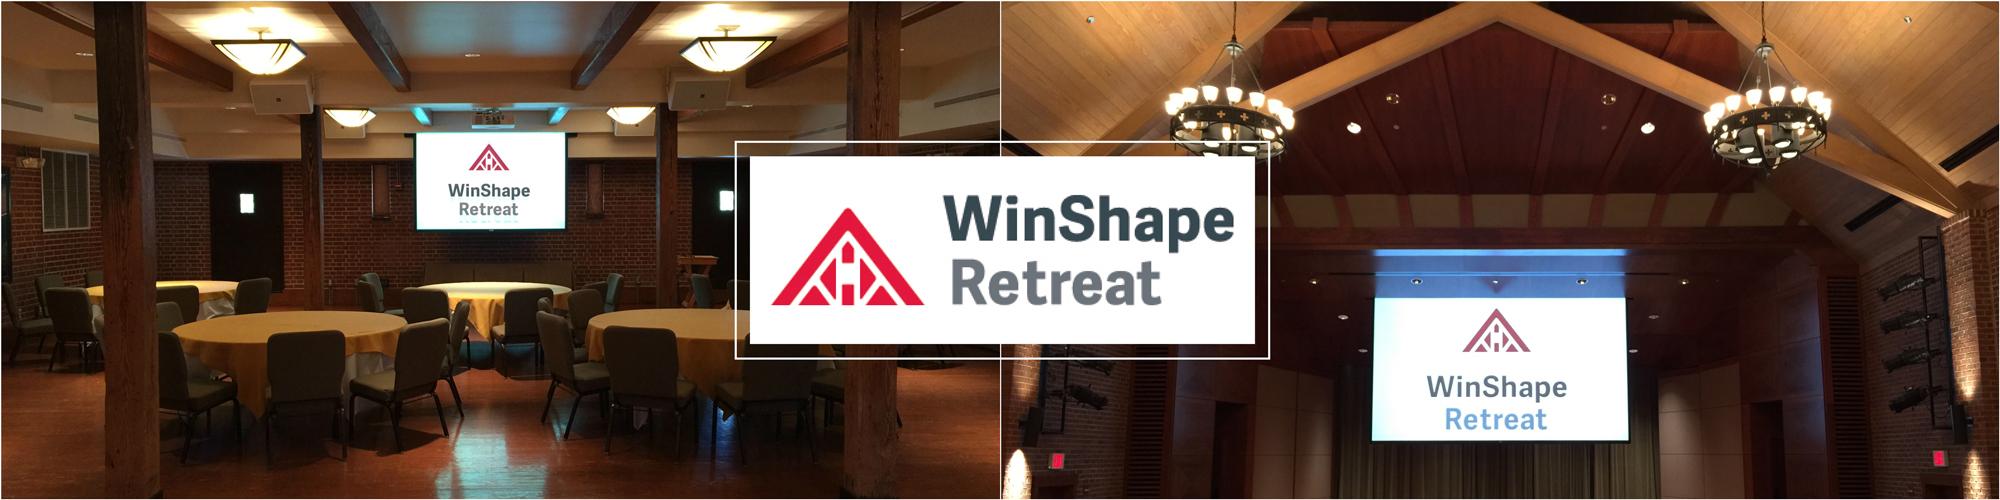 WinShape Retreat